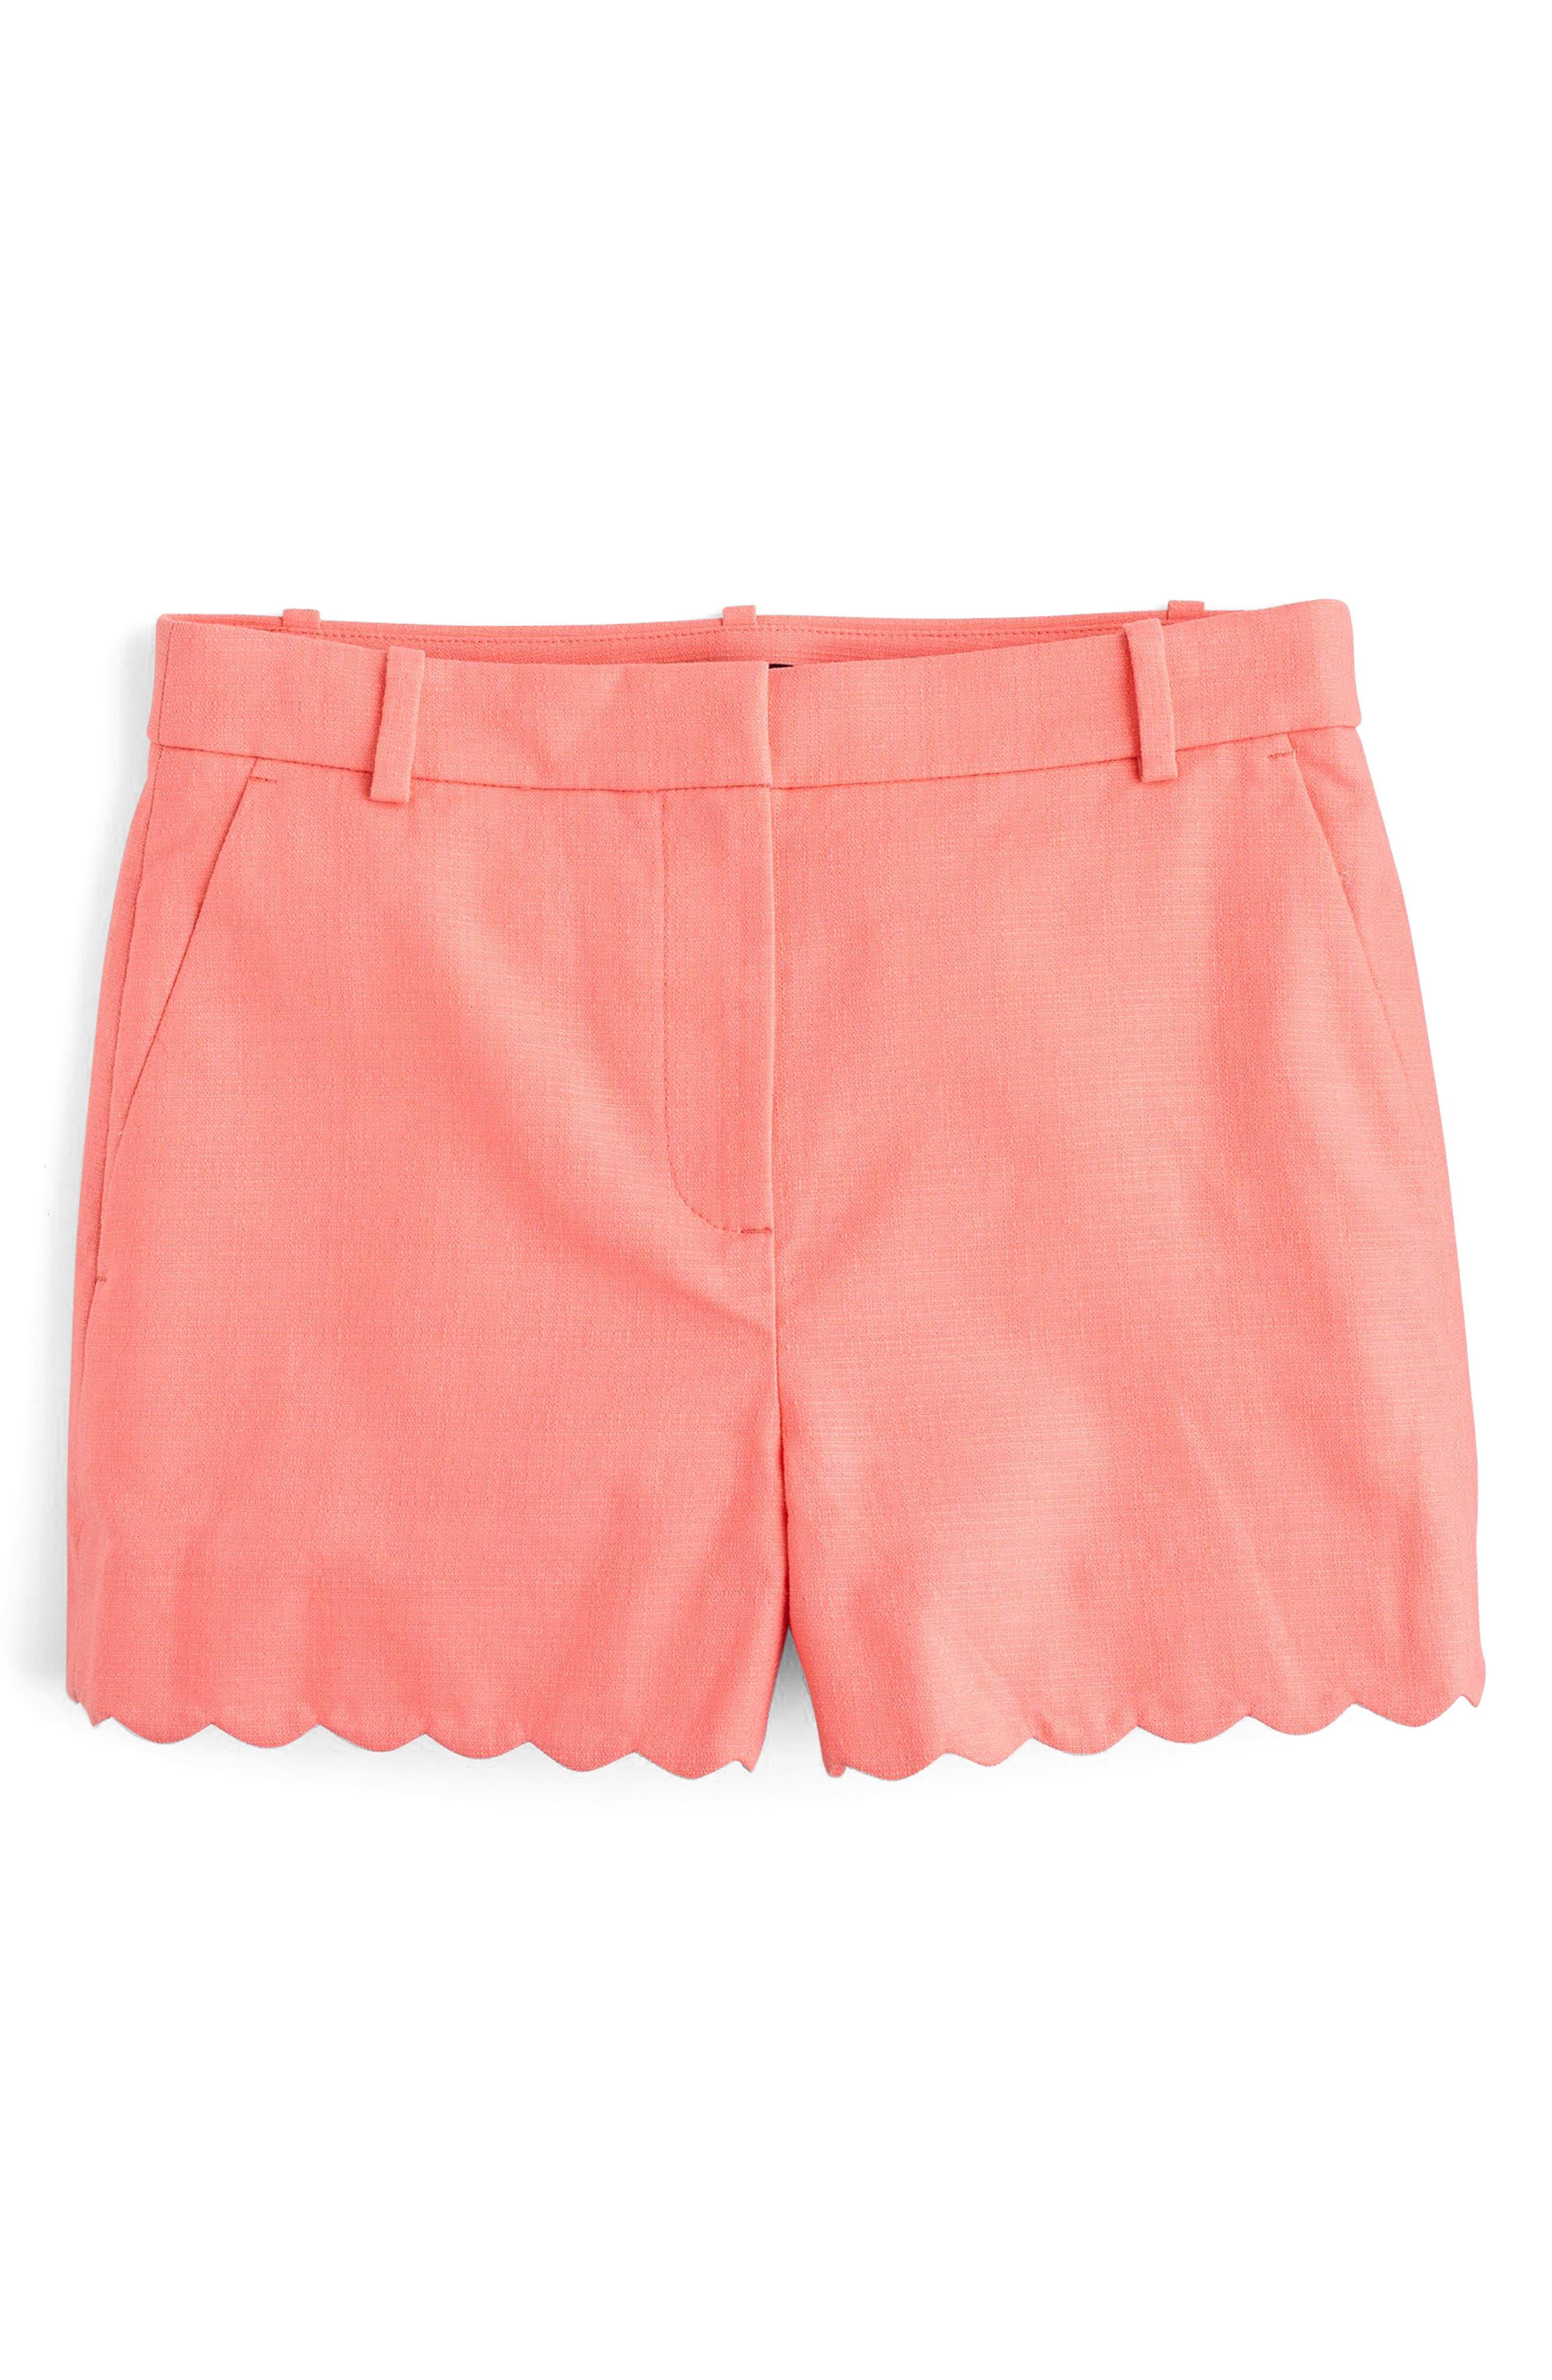 Fiesta Scallop Hem Stretch Cotton Shorts,                             Alternate thumbnail 8, color,